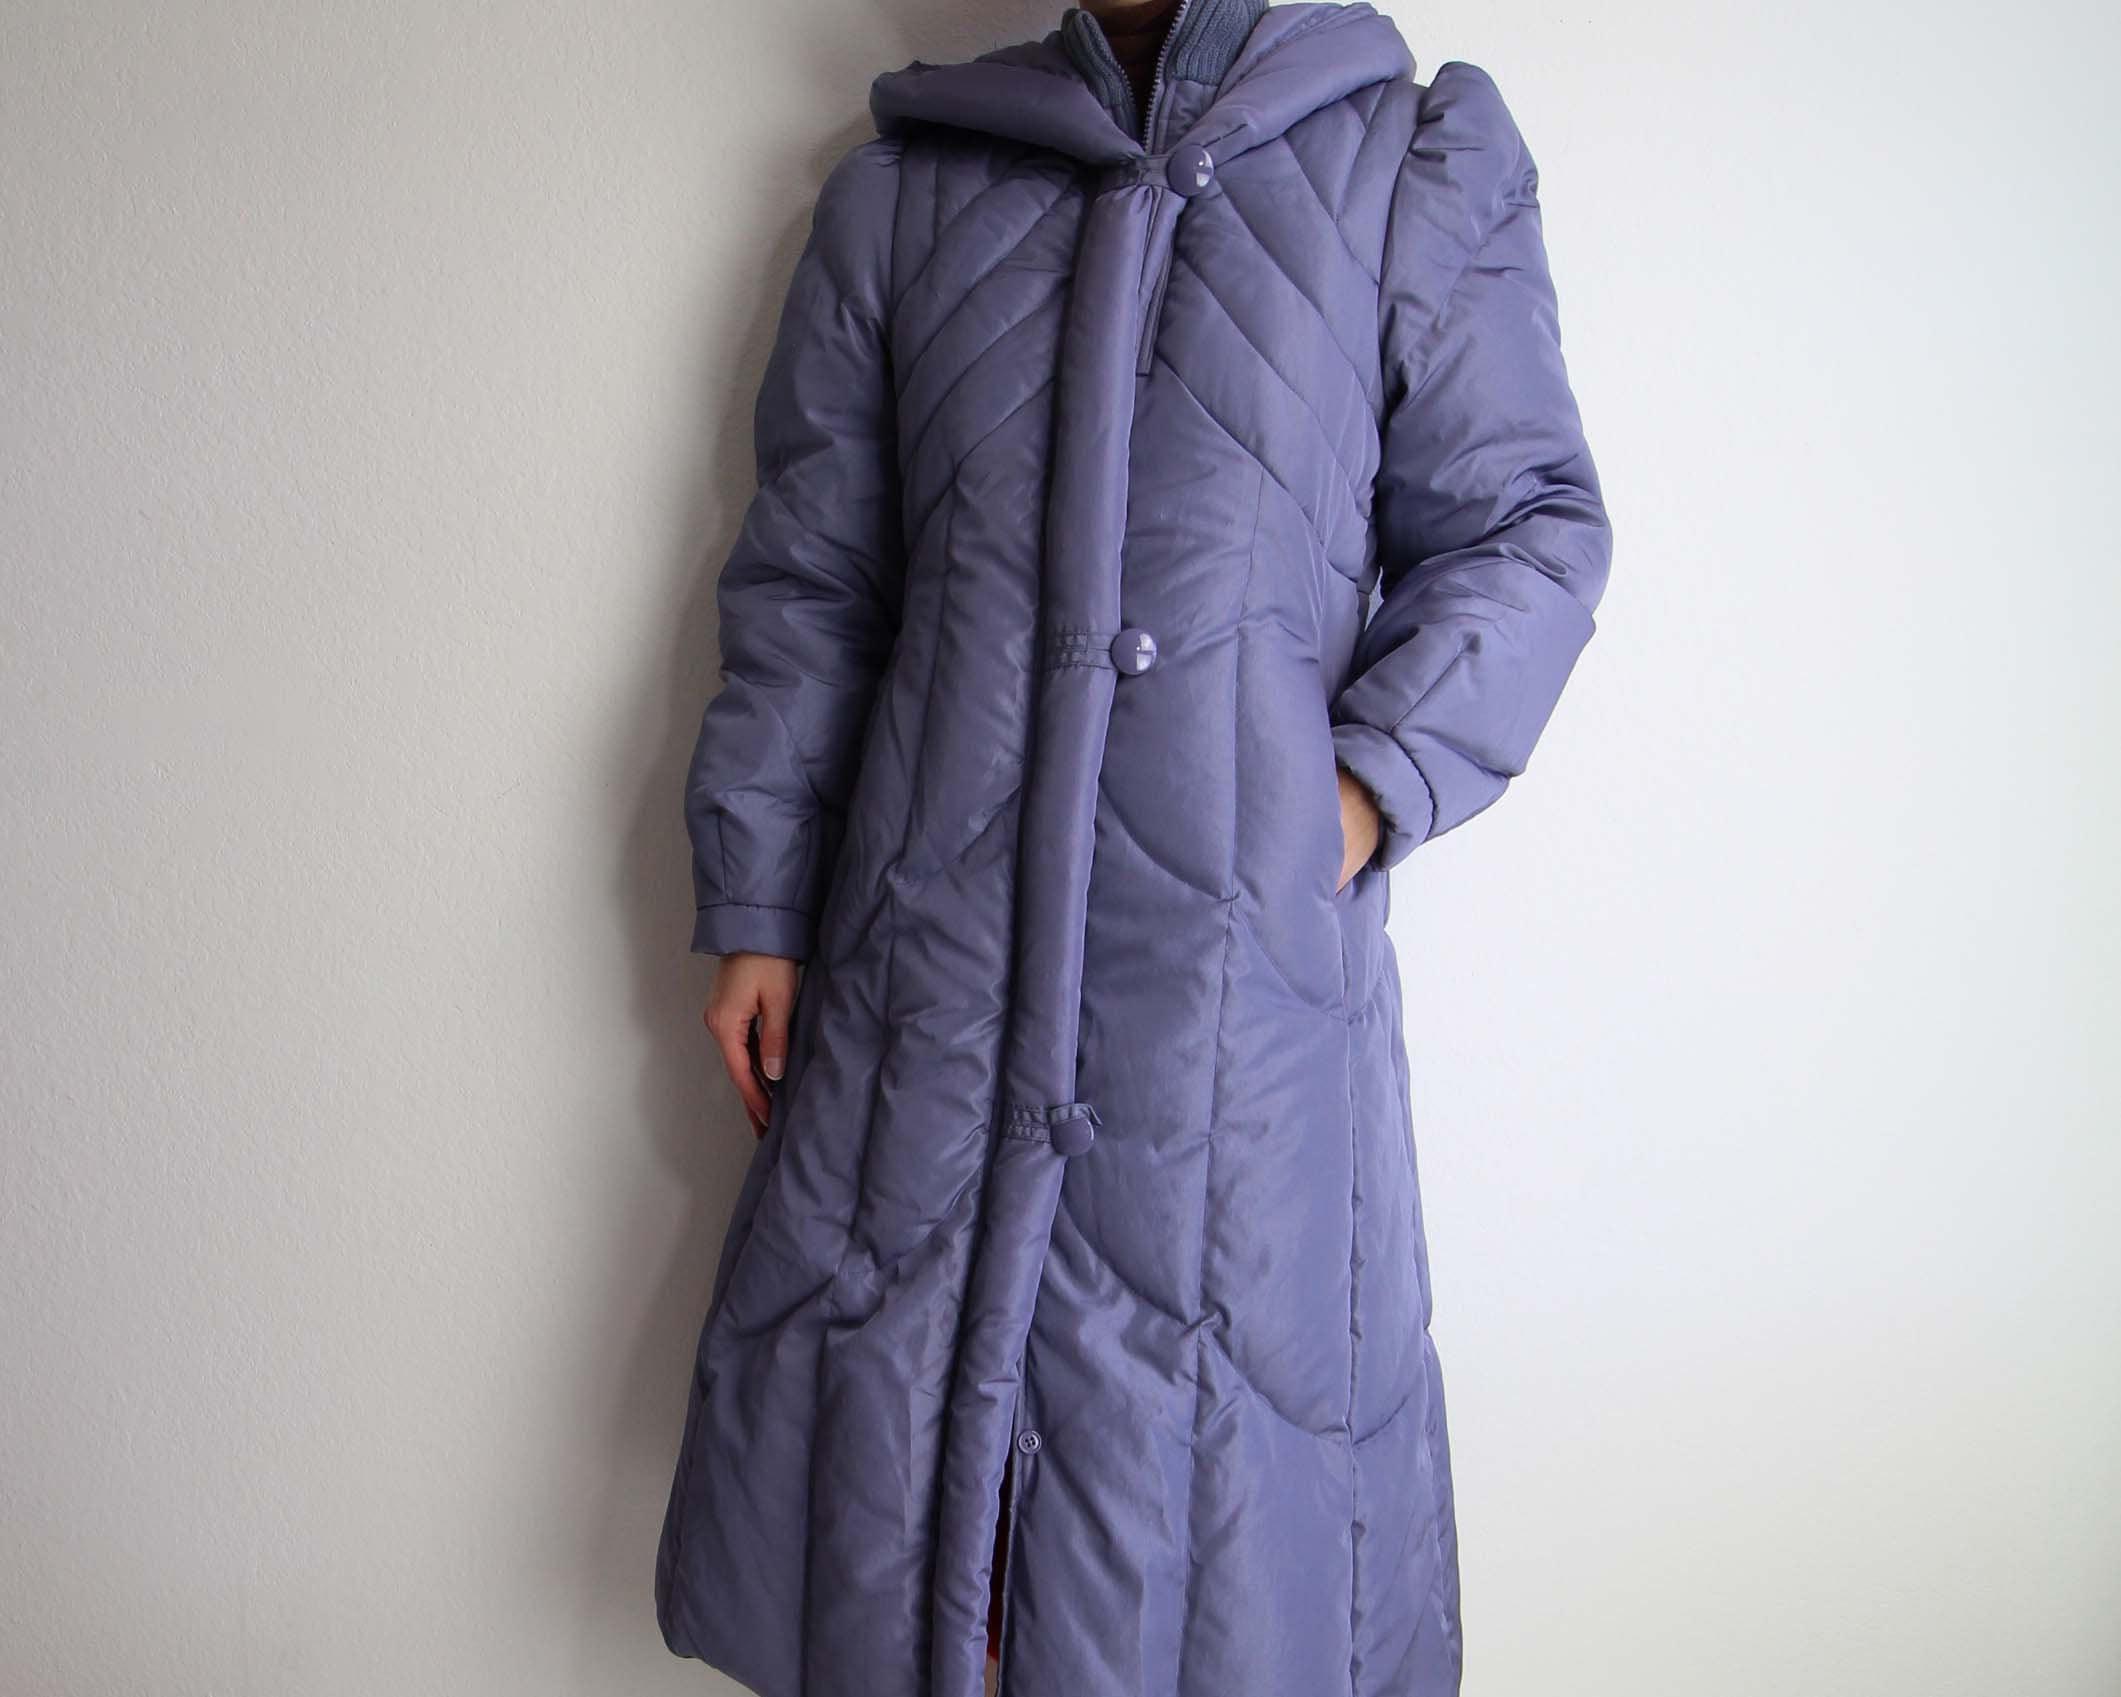 Vintage Puffy Coat 1980s Down Hooded Winter Coat Purple Womens